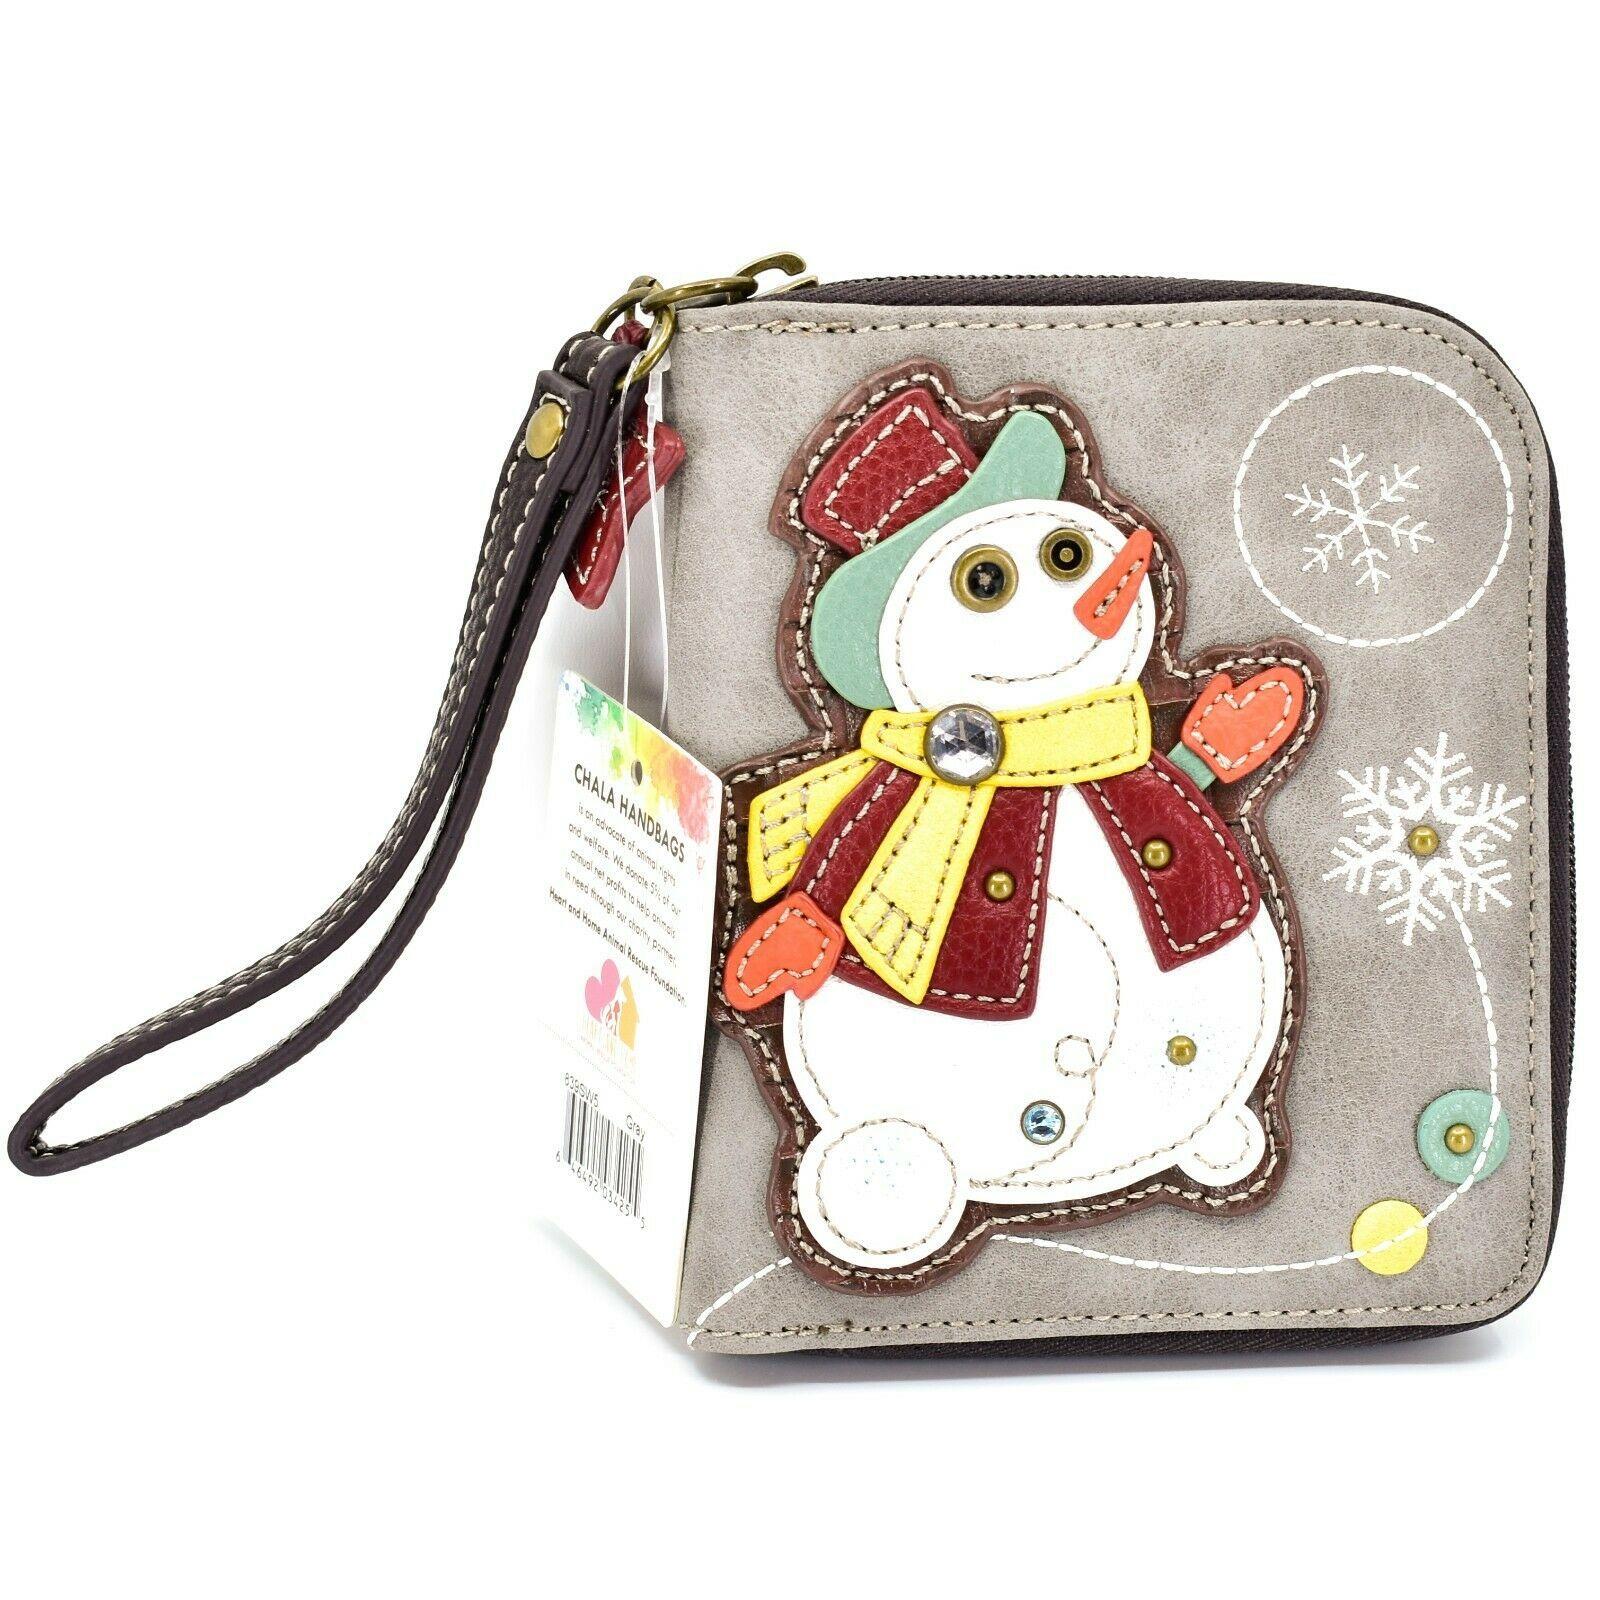 Chala Handbags Faux Leather Snowman Winter Gray Zip Around Wristlet Wallet